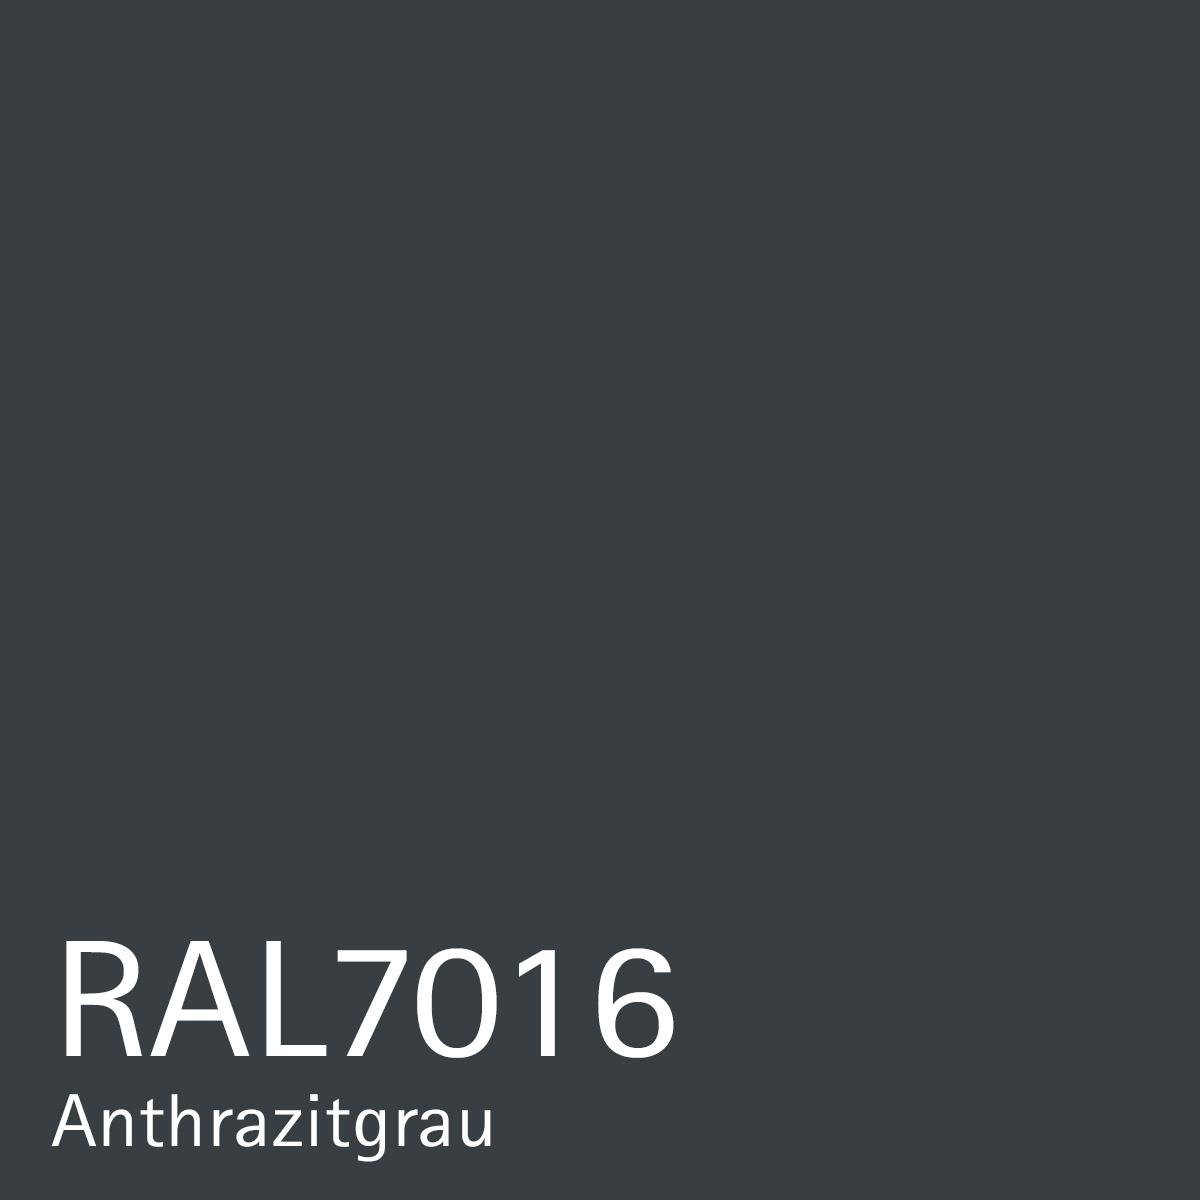 RAL7016 Anthrazit